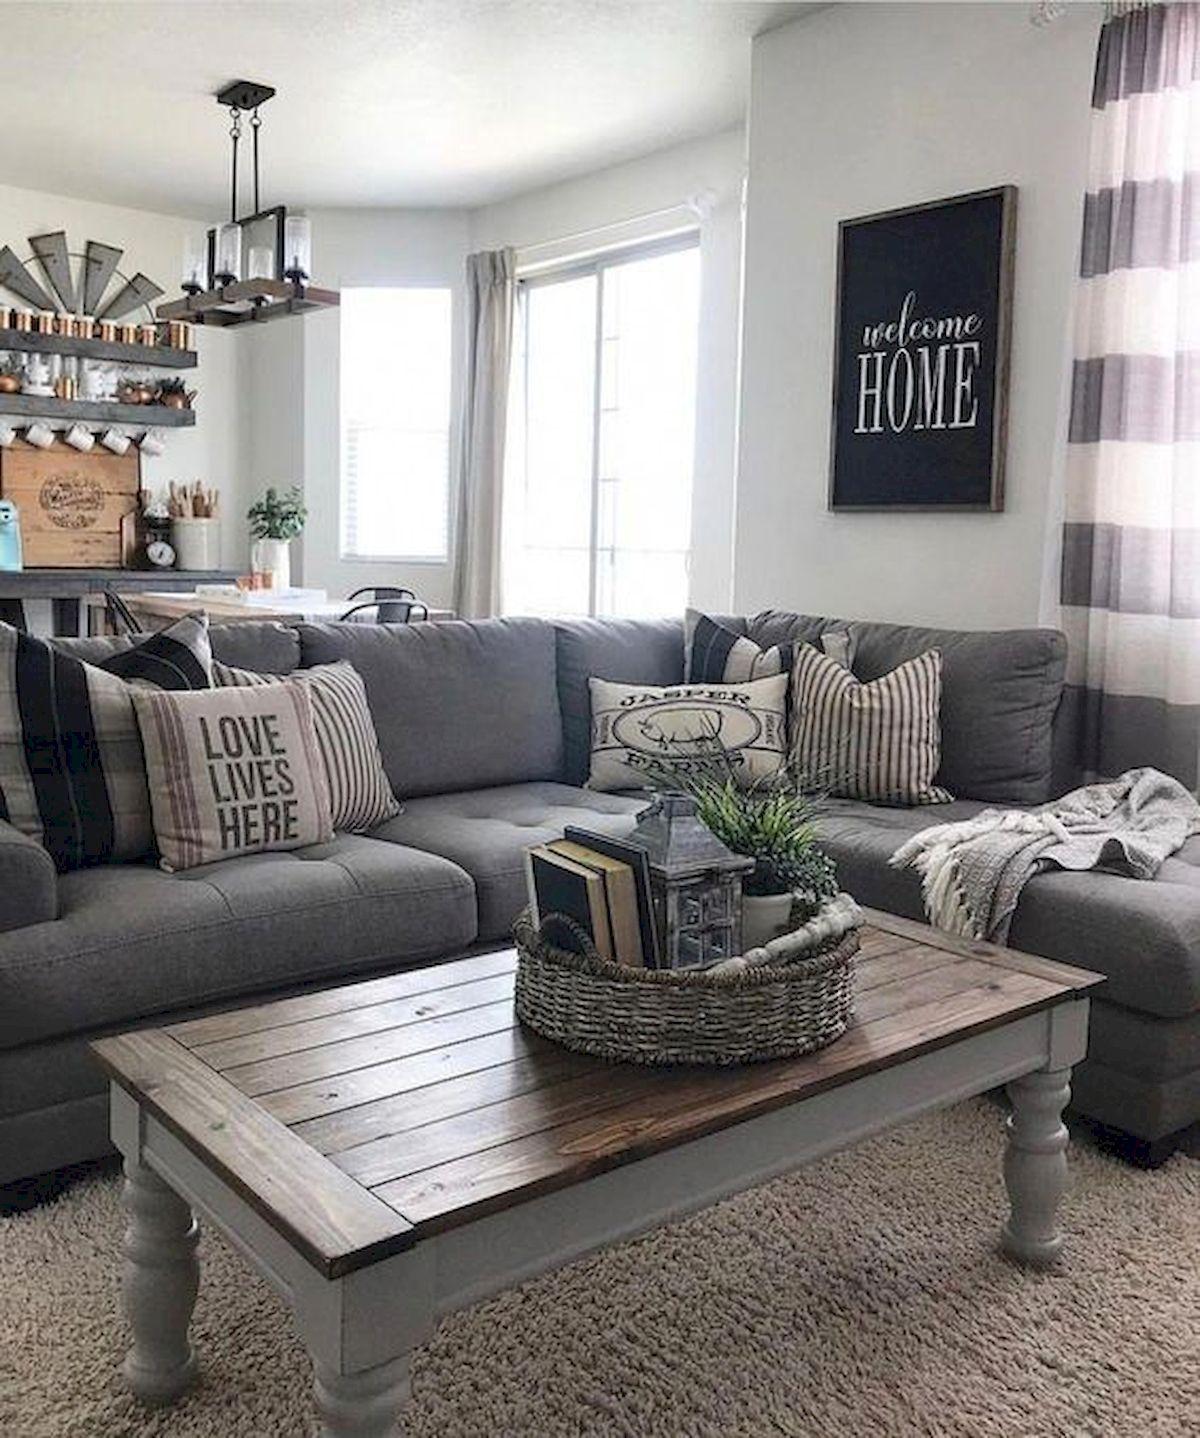 50 Best Modern Farmhouse Decor Ideas For Living Room (1 images